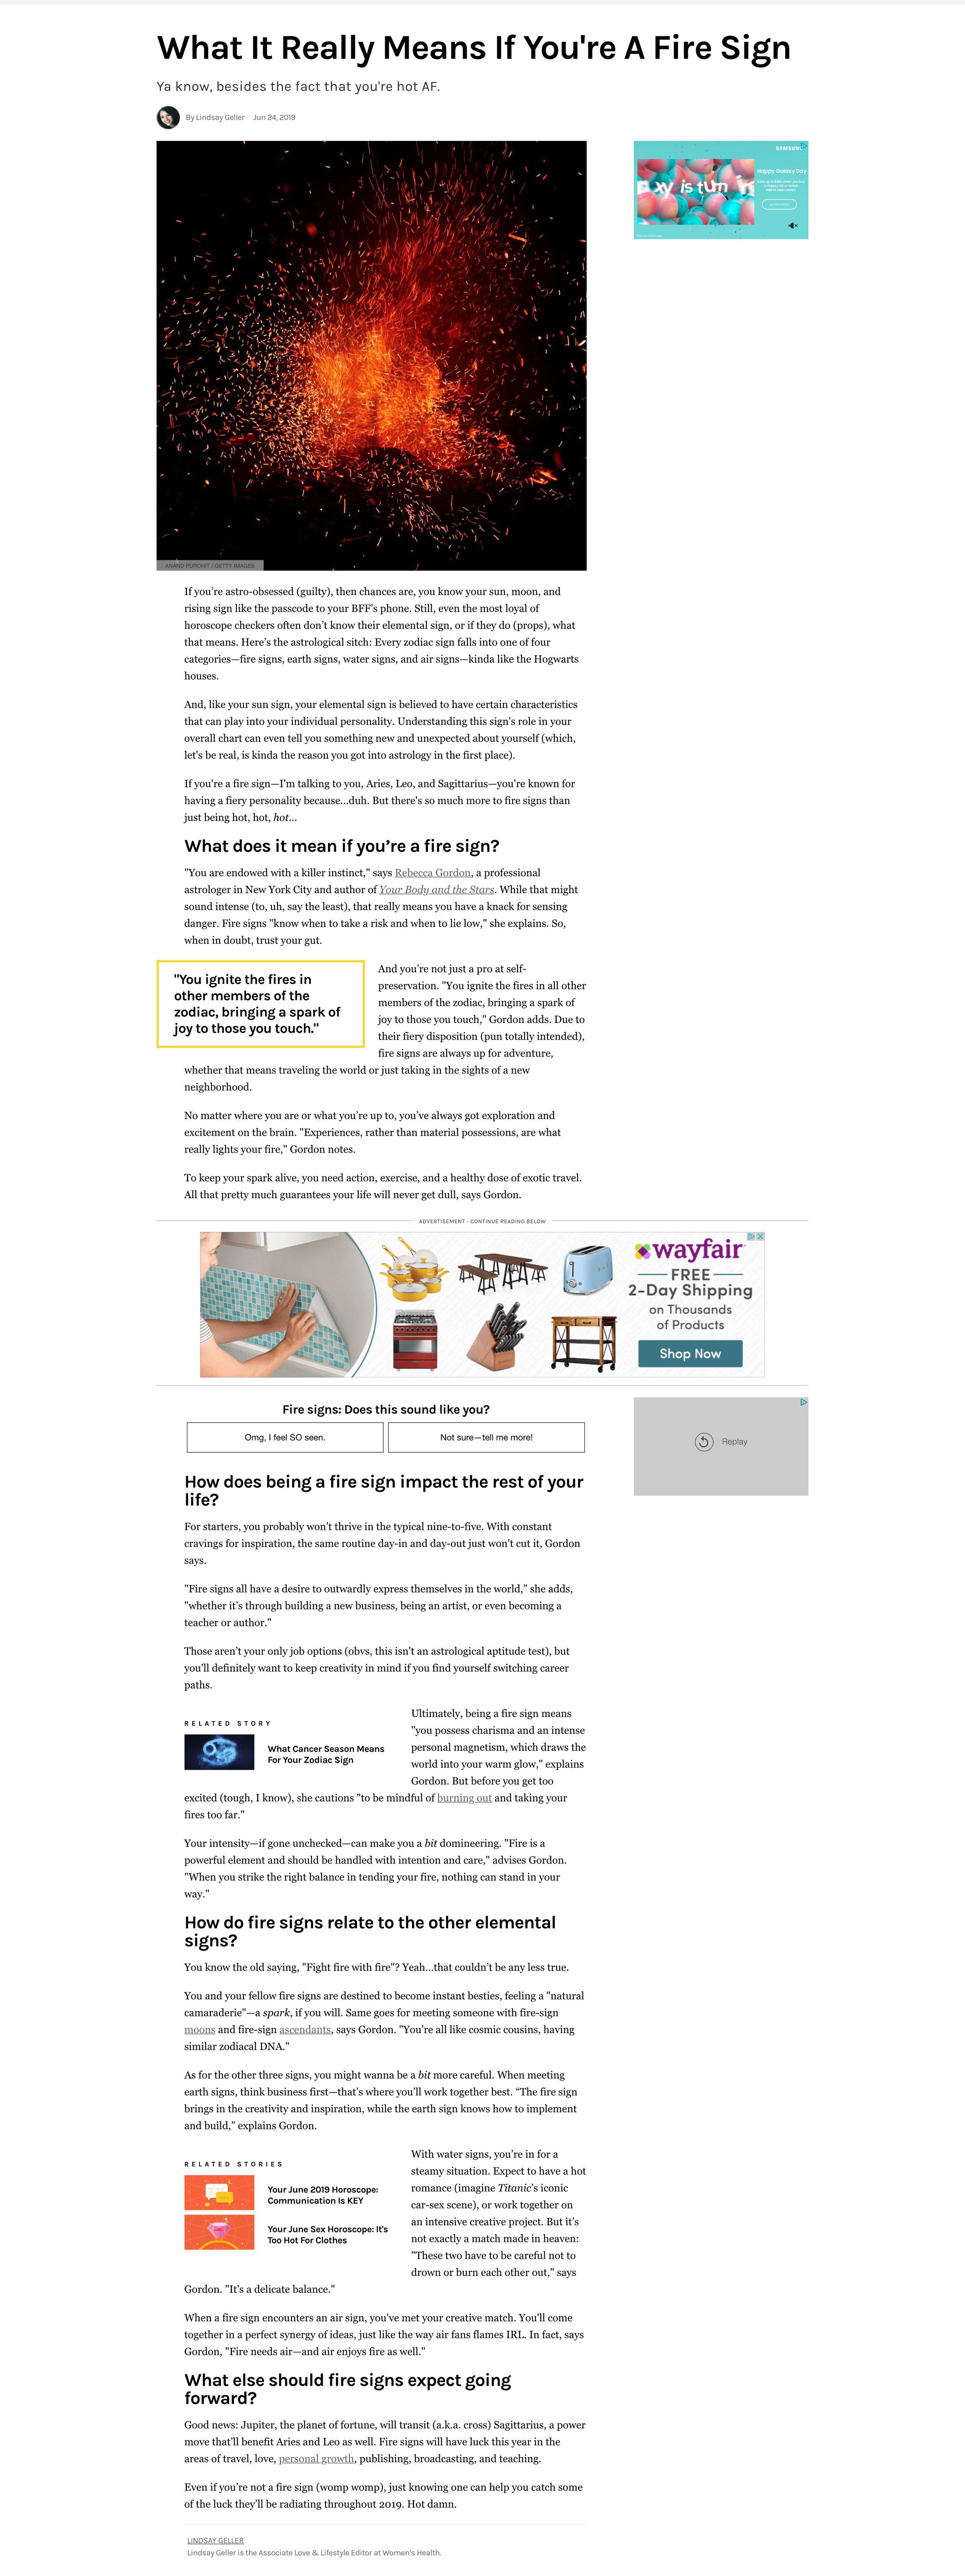 screencapture-womenshealthmag-life-a28105049-fire-signs-2019-06-25-18_32_12.jpg